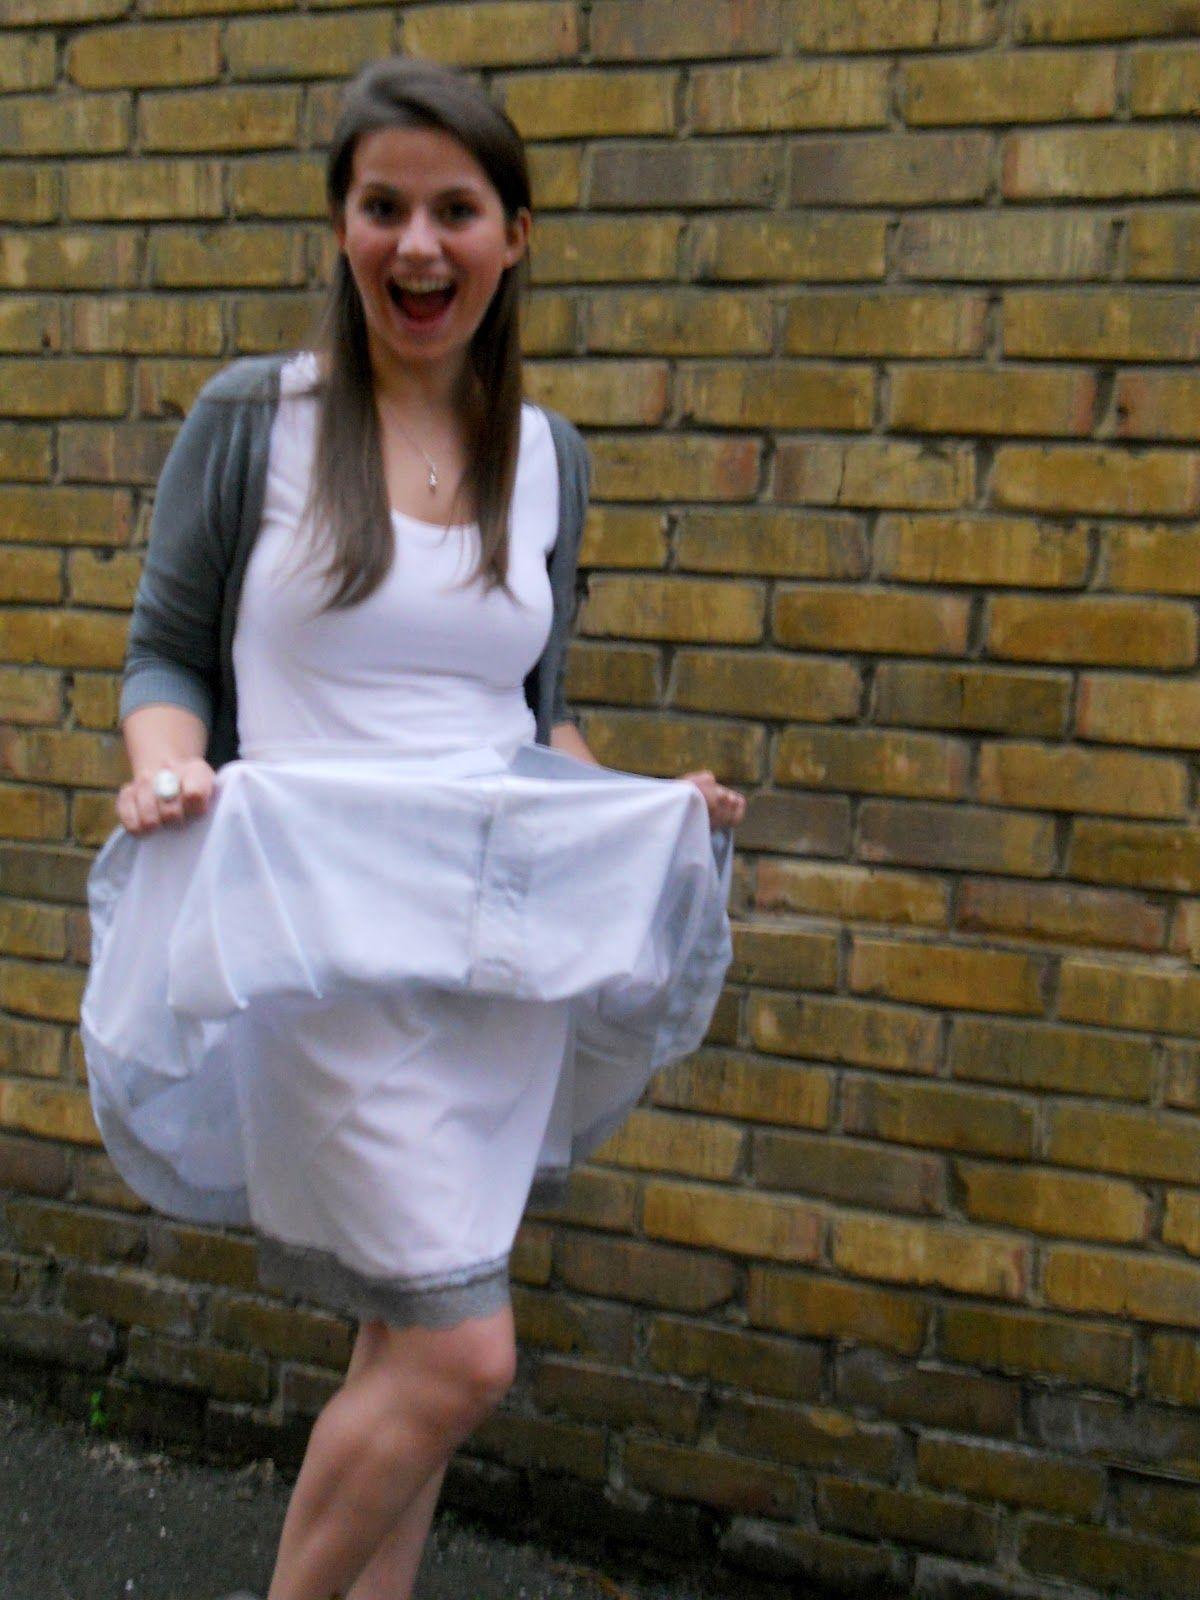 fancy dress upskirt Upskirt white slip, from Unmentionables